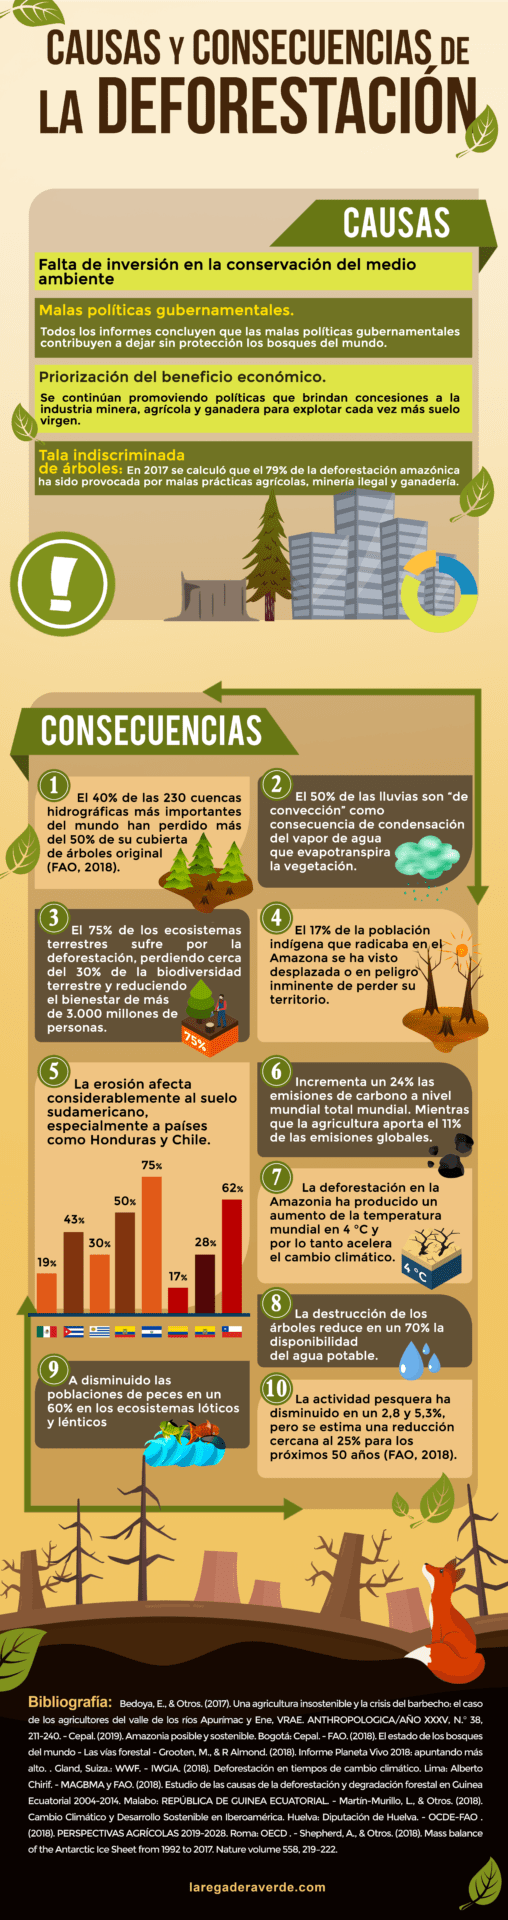 infografía deforestación 2